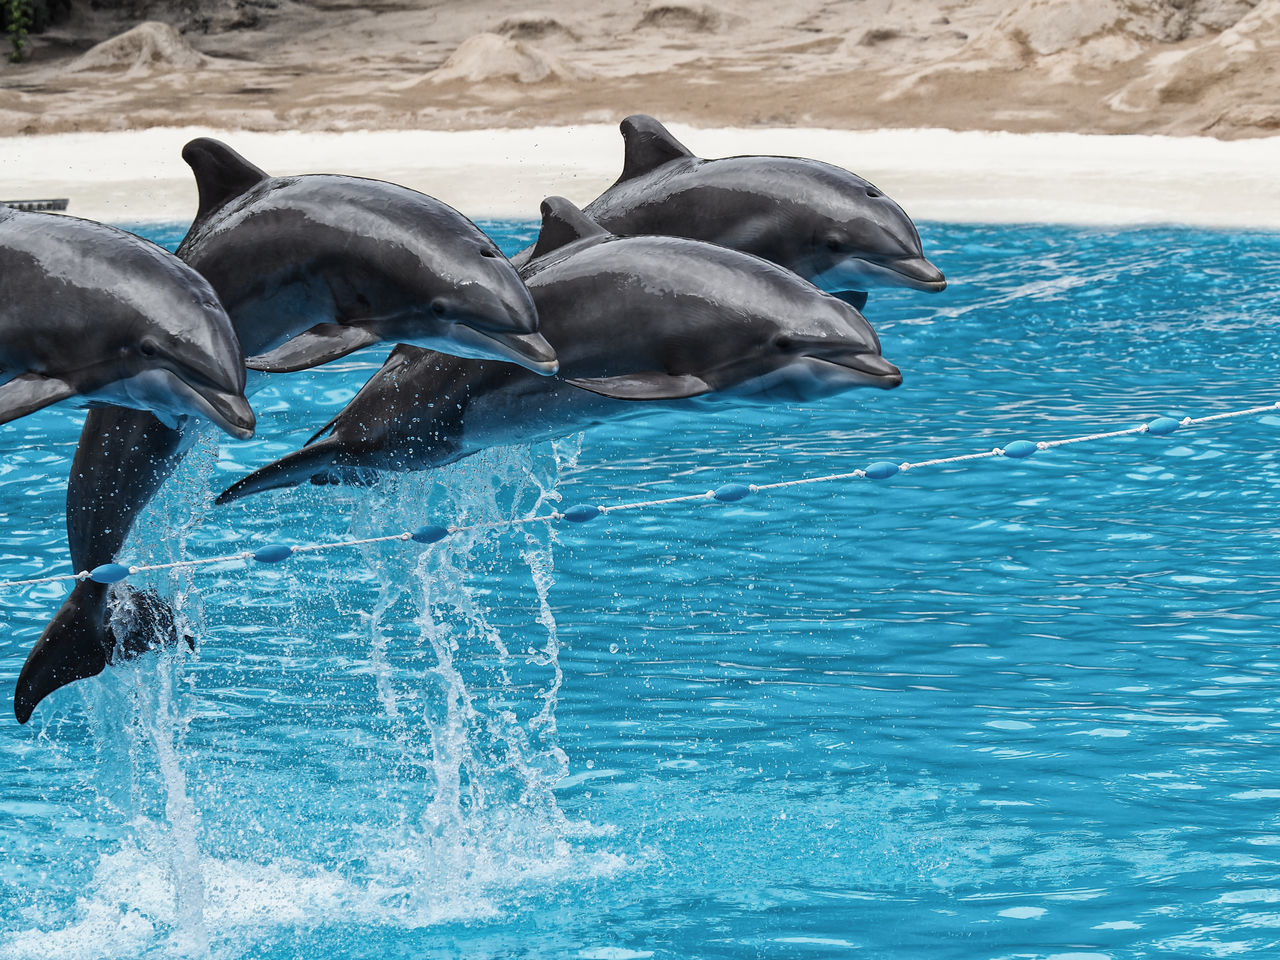 Animal Themes Animal Wildlife Animals In The Wild Aquatic Mammal Coordination Day Dolphin LoroParque Mammal Motion Nature No People Outdoors Sea Splashing Teneriffa Water